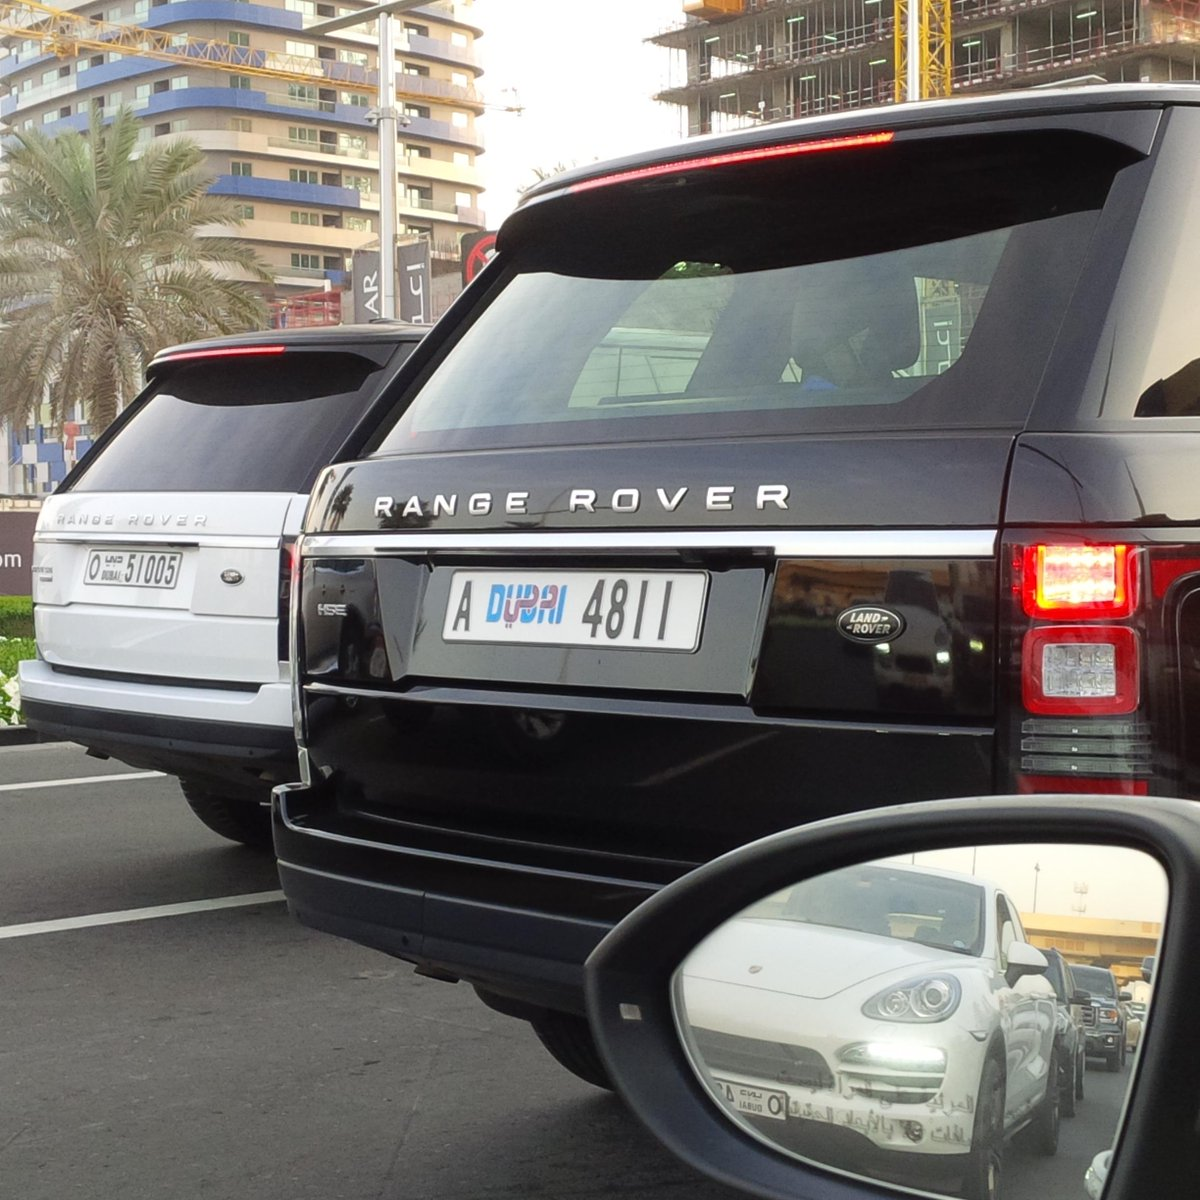 Kh On Twitter New Dubai Number Plates Expo 2020